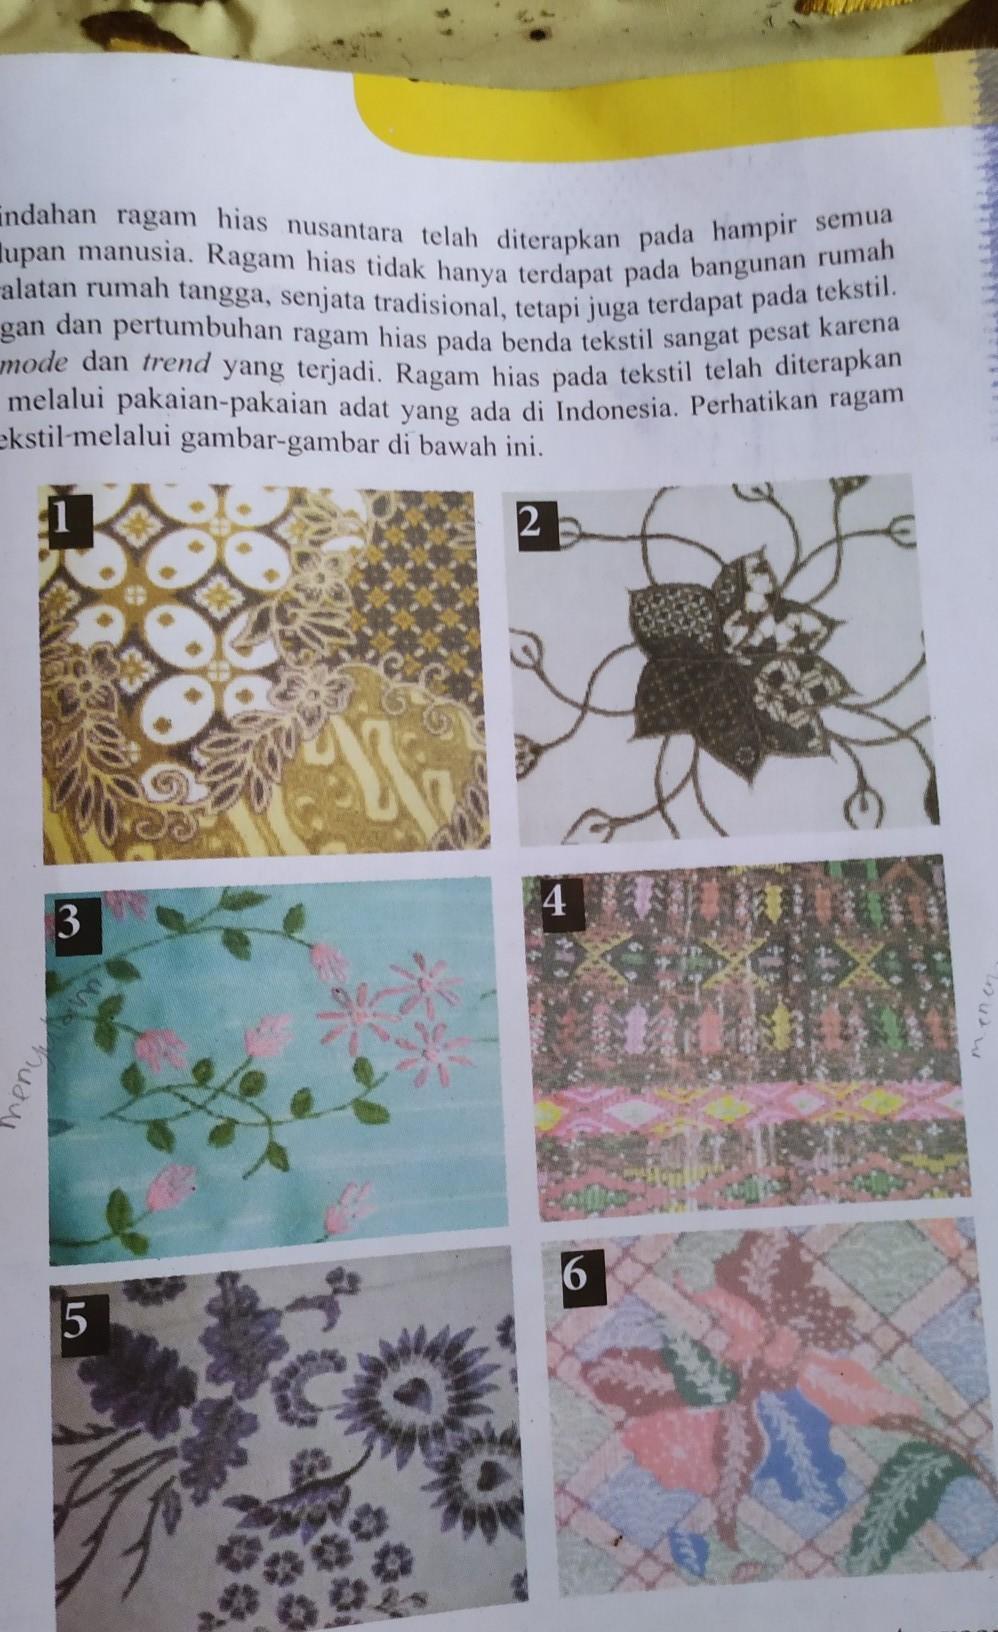 Pada Gambar 1 6 Membuat Ragam Hias Pada Tekstil Tersebut Menggunakan Teknik Tolong Disebutkan Brainly Co Id